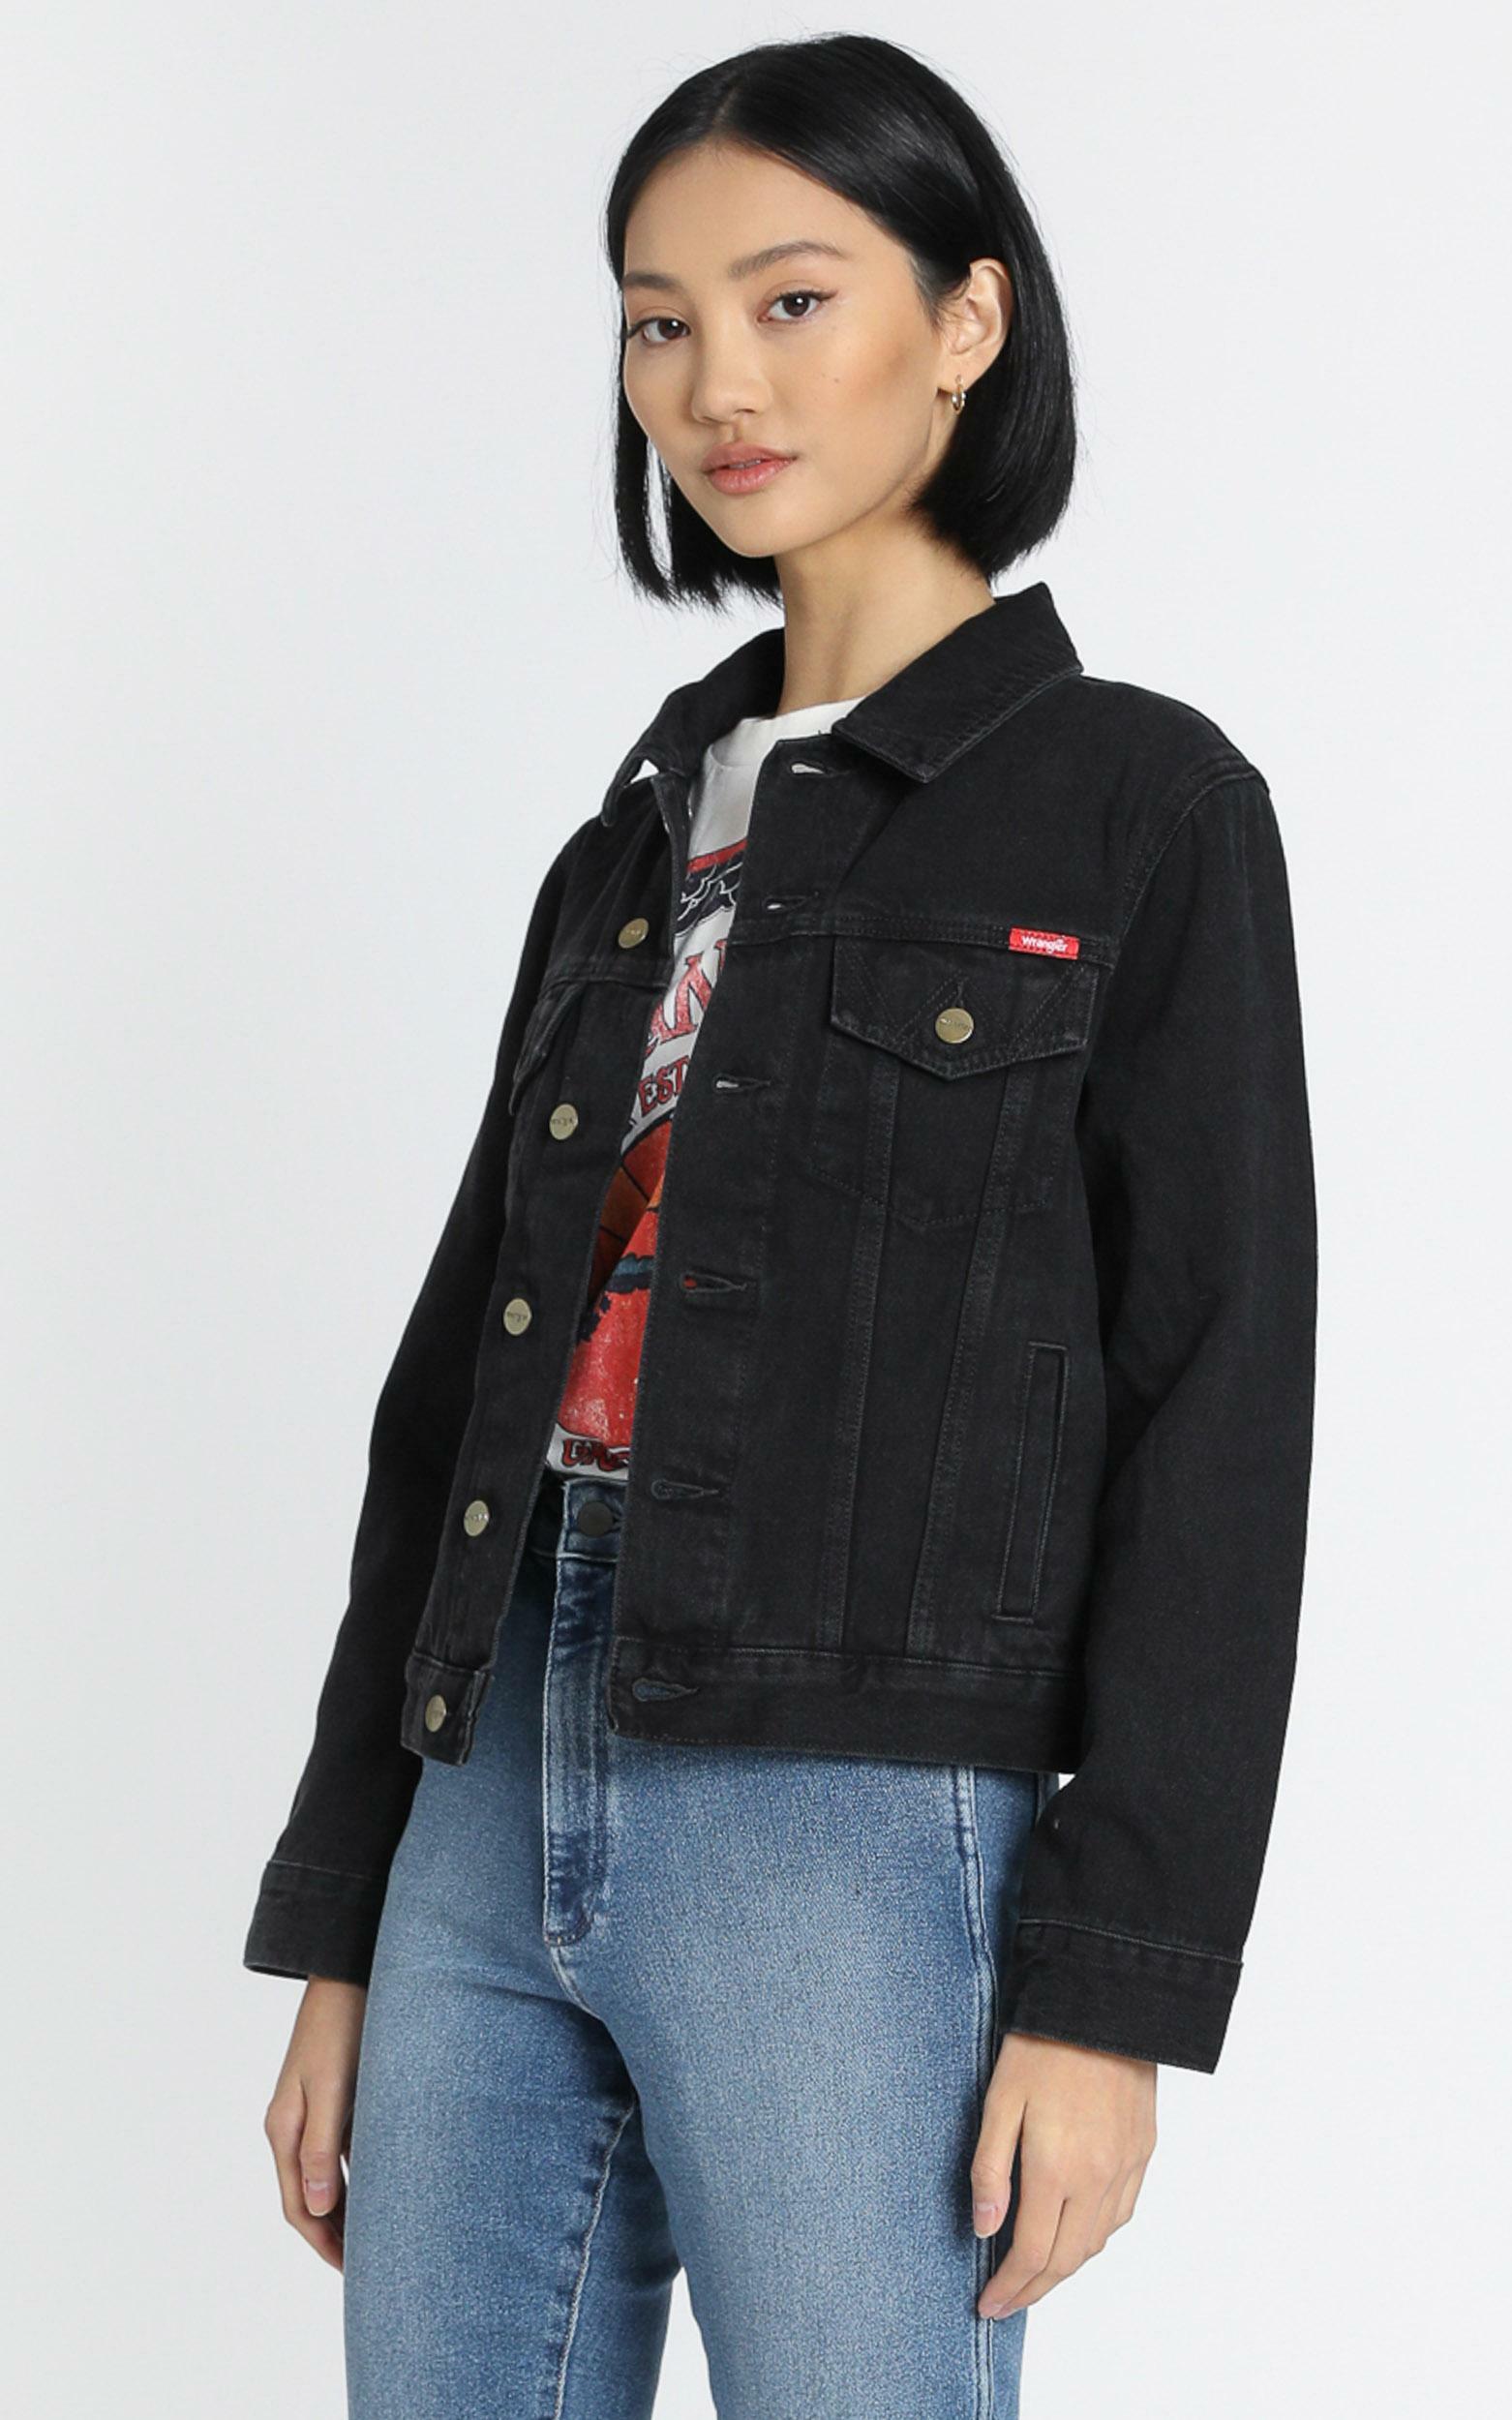 Wrangler - Classic Denim Jacket in Starr Stone - 6 (XS), Black, hi-res image number null